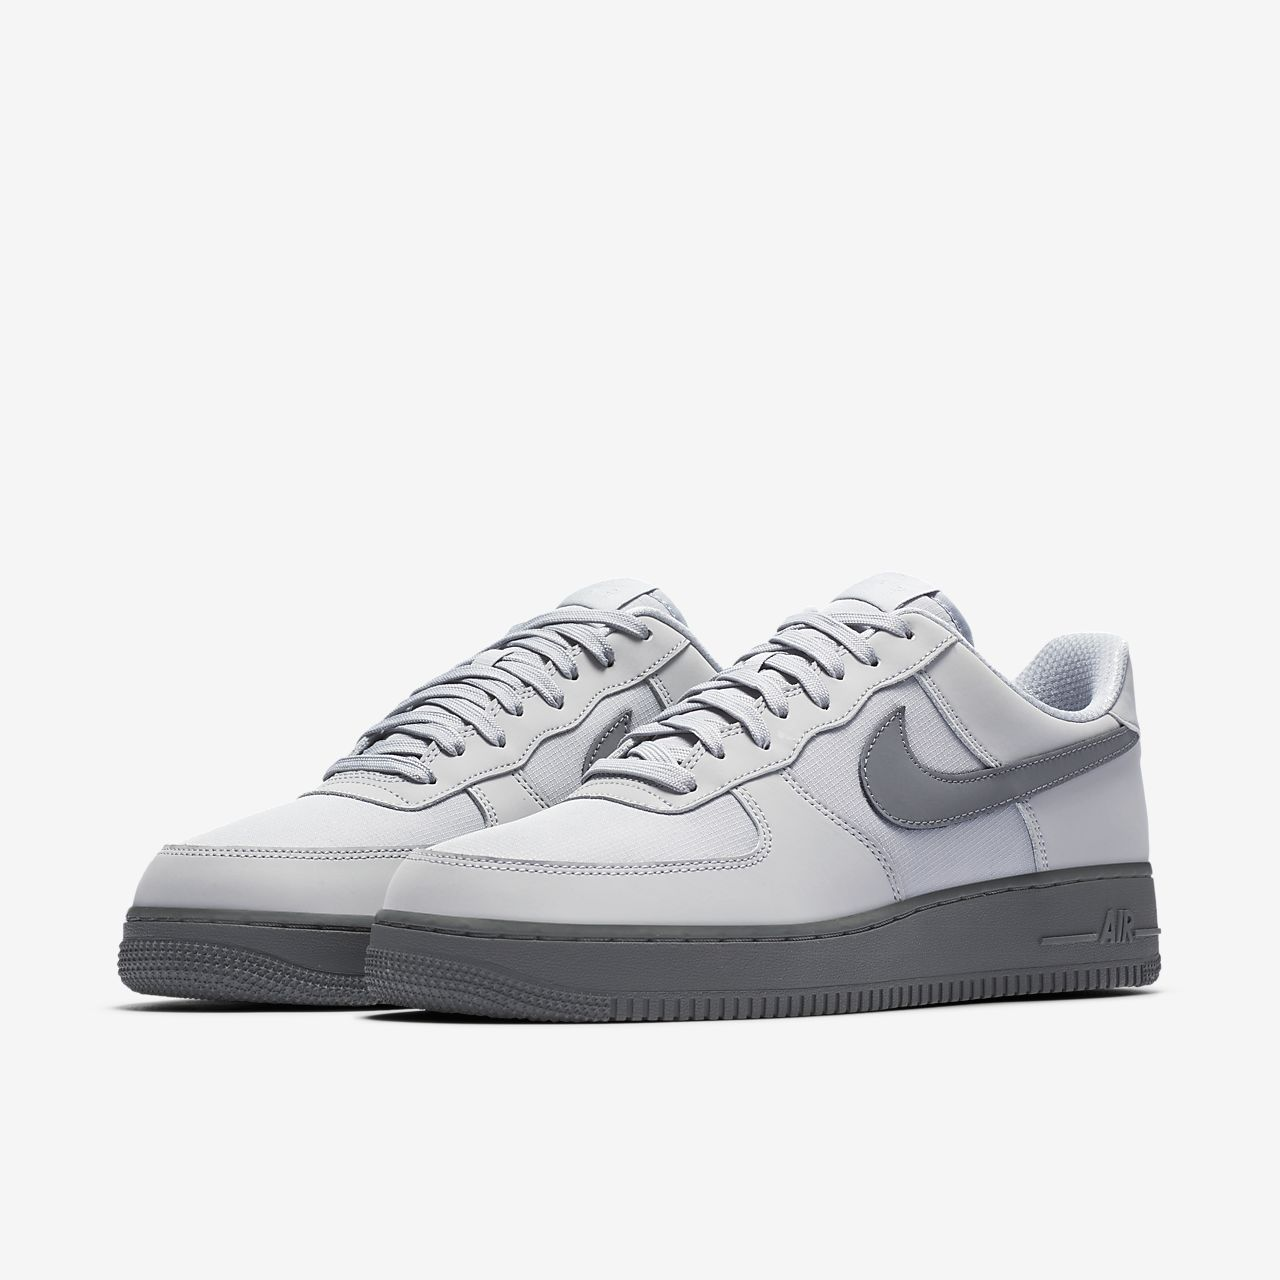 a3ea5a0bdd2 Chaussure Nike Air Force 1  07 pour Homme. Nike.com CA